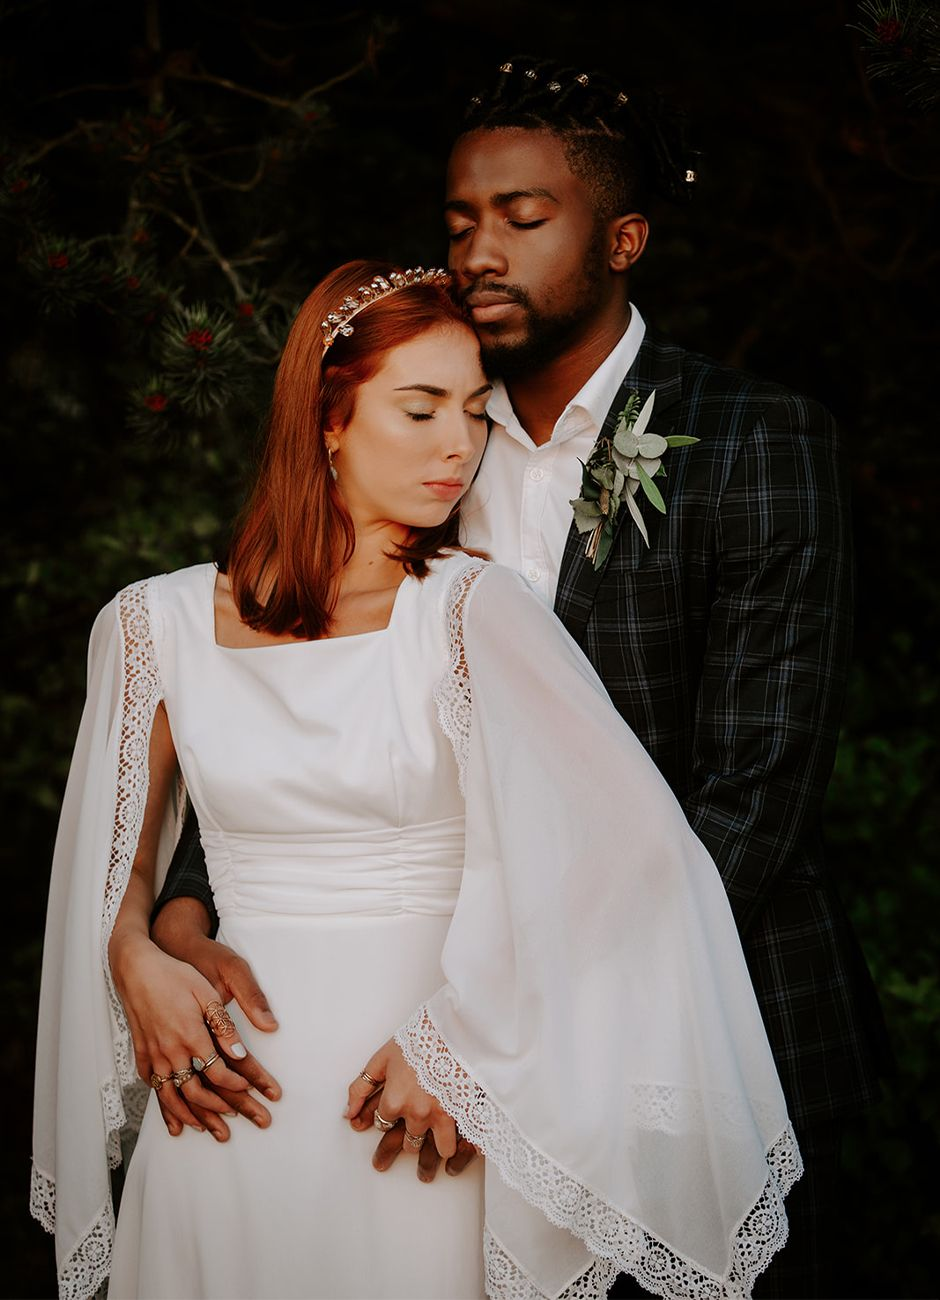 cape sleeve wedding dress